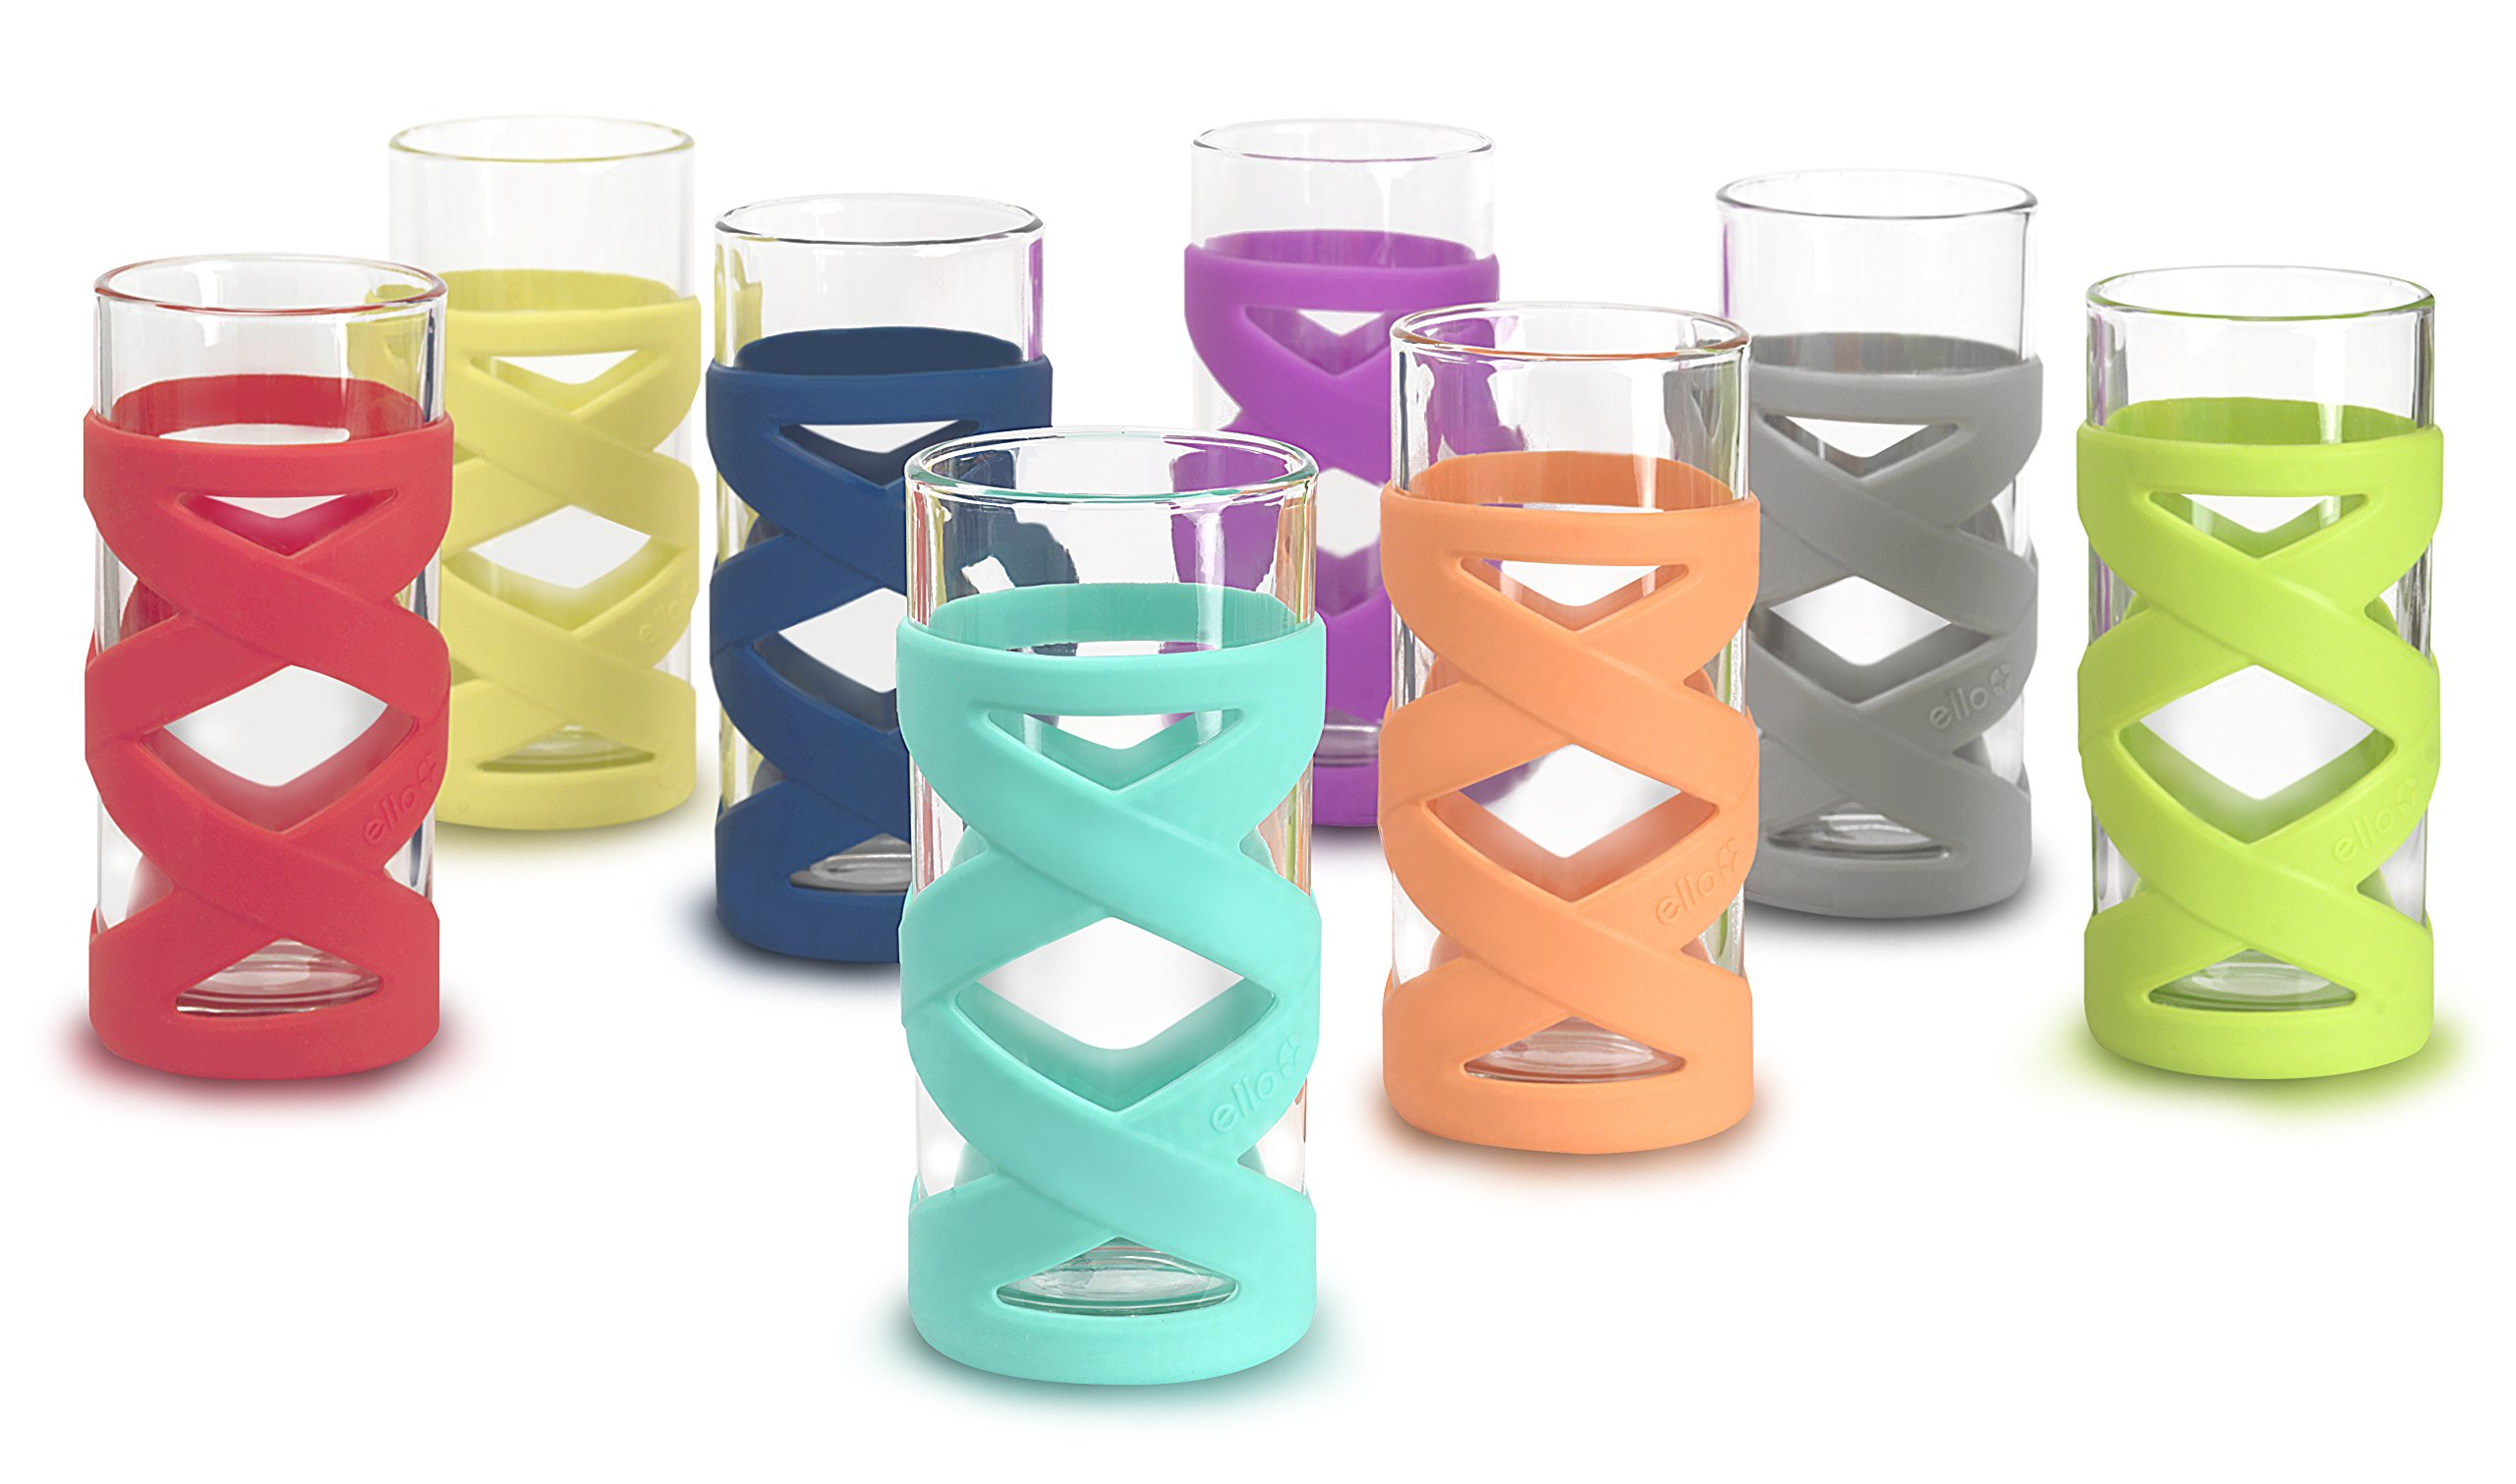 Ello Tallboy 8pc Silicone Glassware Set by Ello (Image #2)